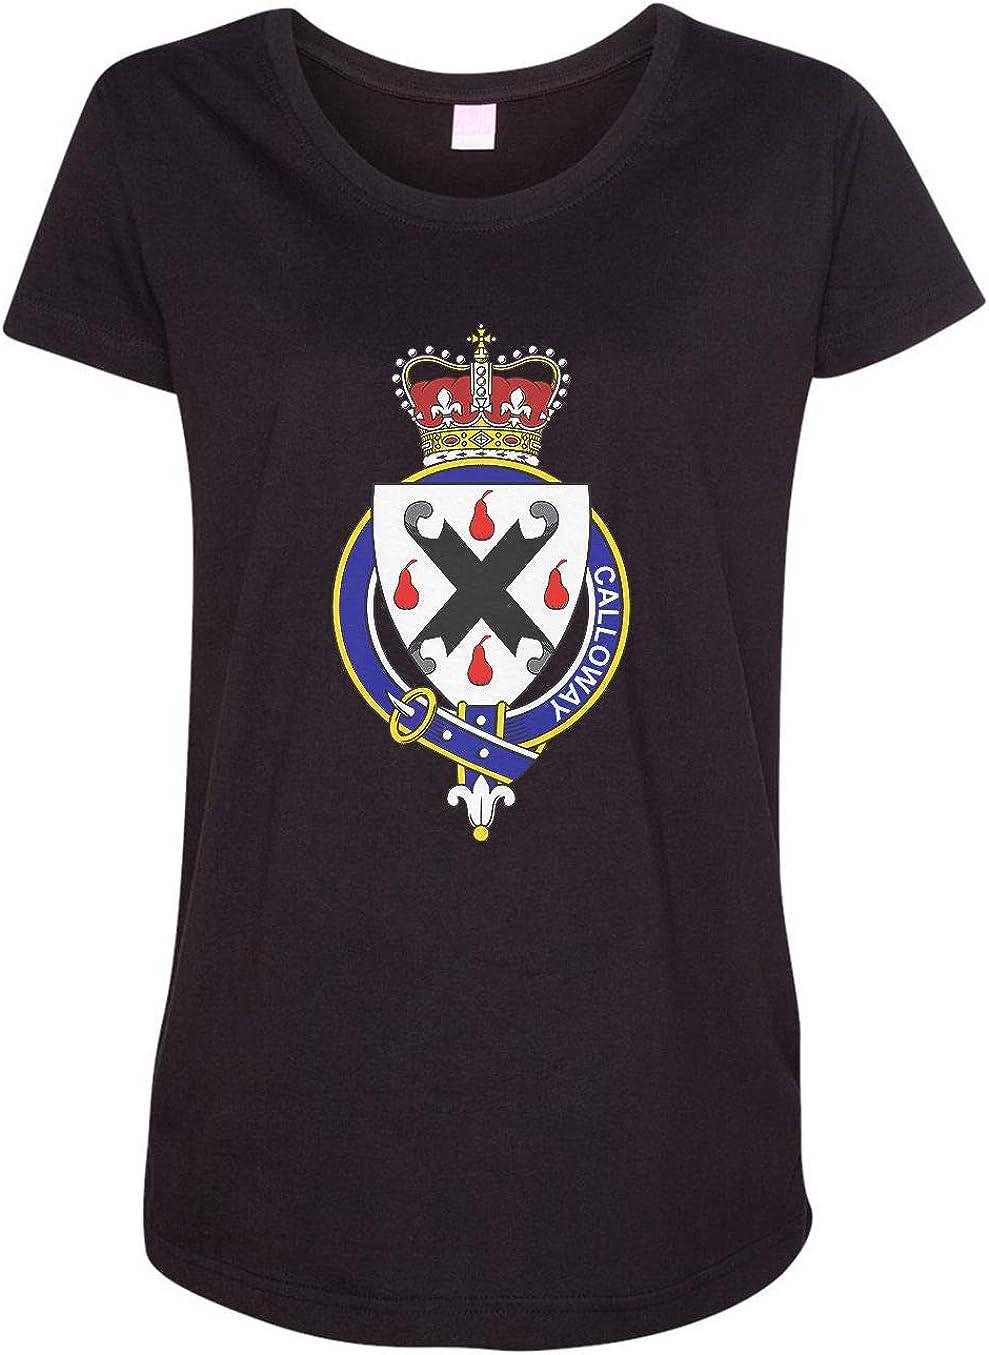 HARD EDGE DESIGN Women's English Garter Family Calloway T-Shirt